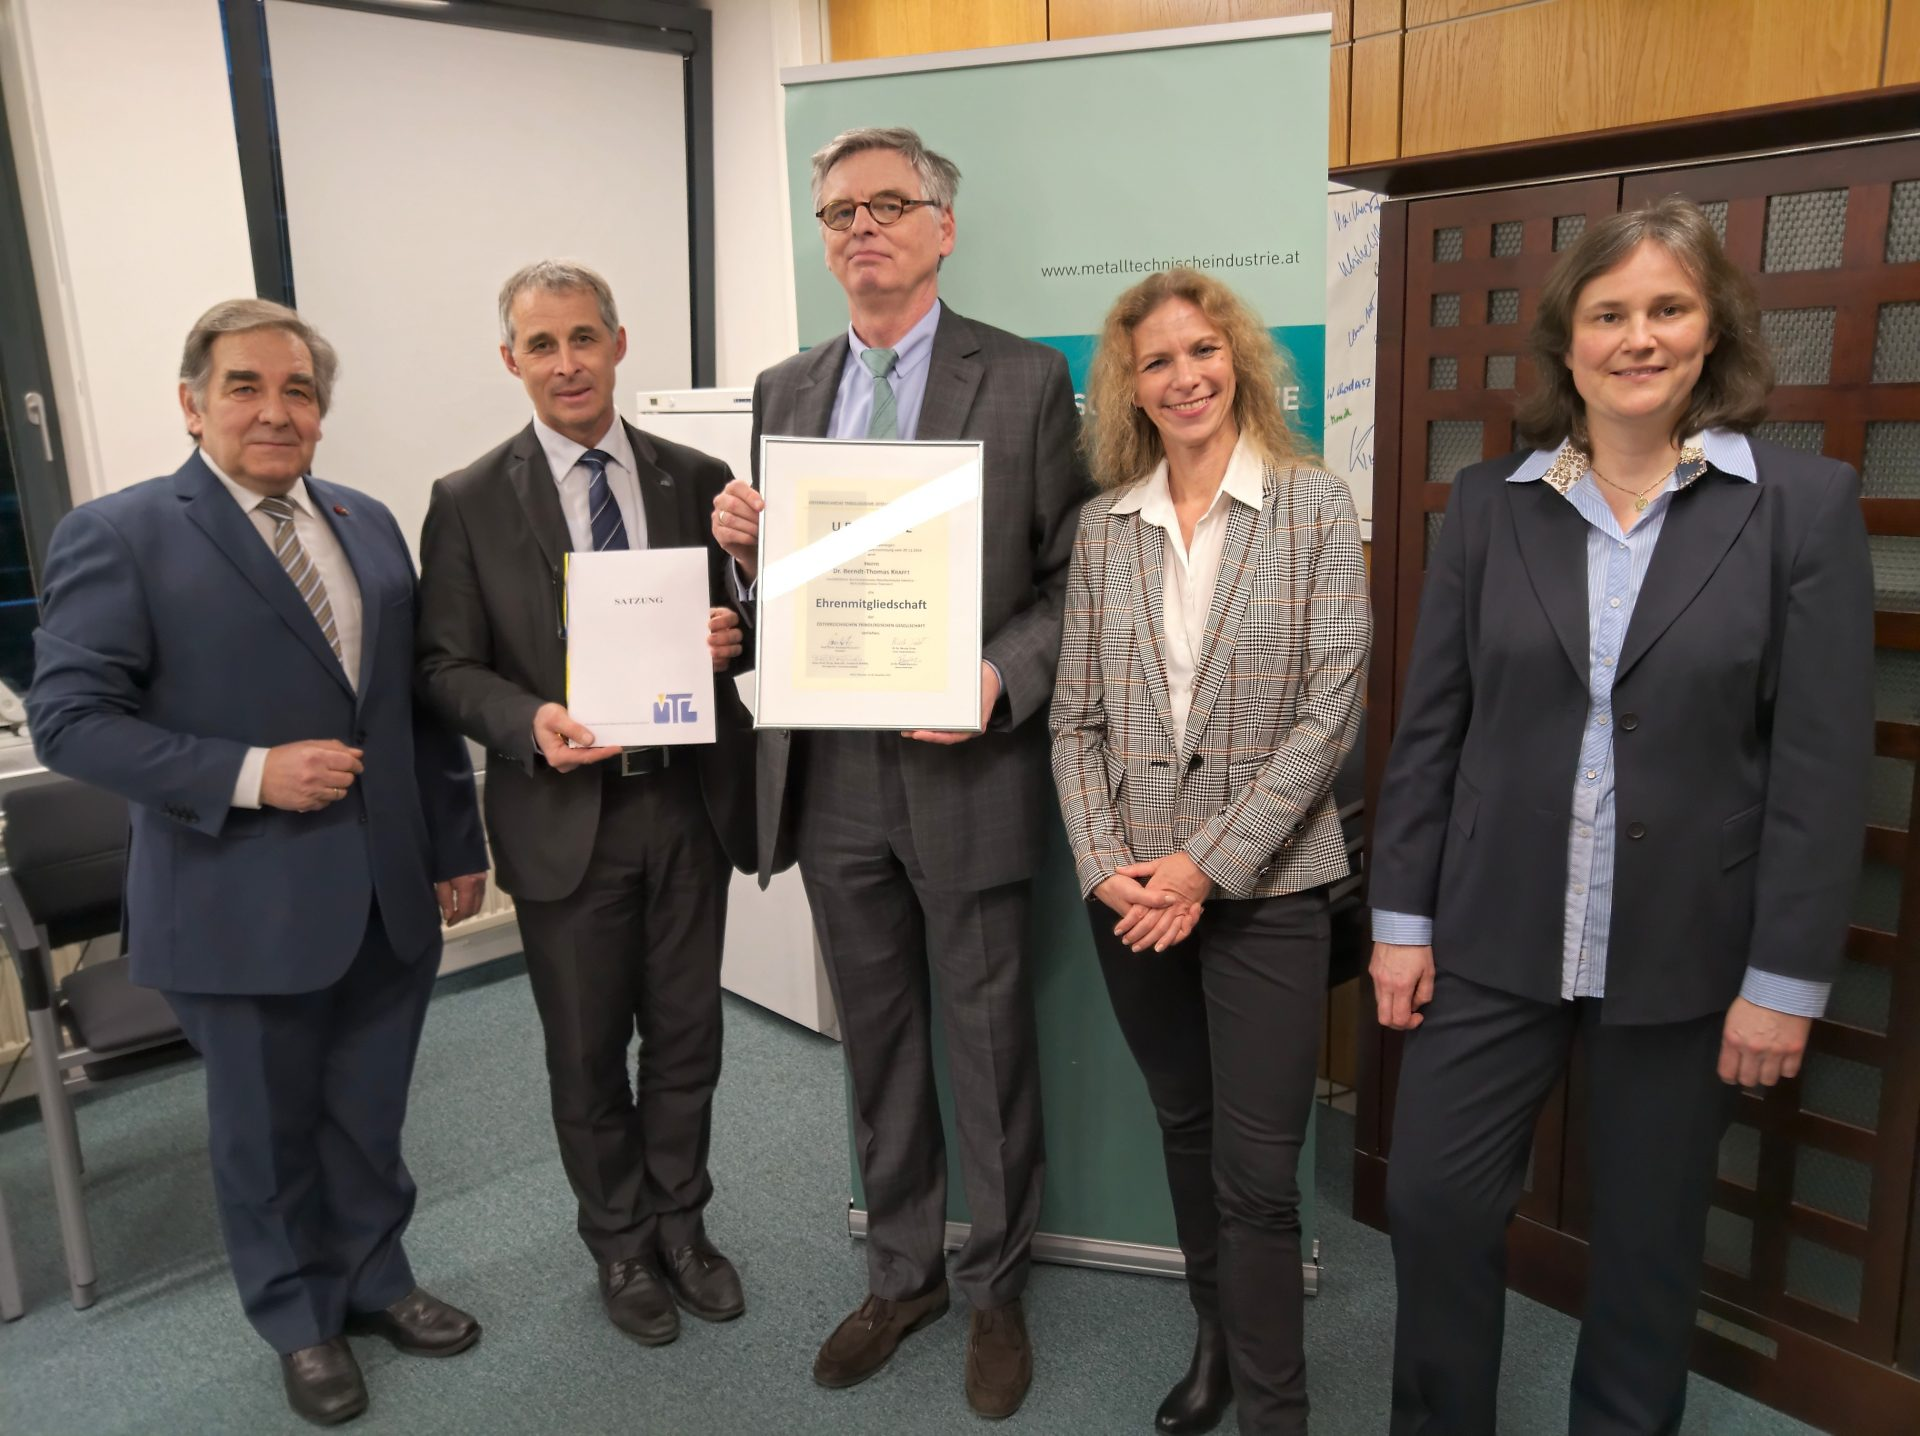 The ÖTG Honorary Membership for the FMTI Managing Director Dr. Berndt-Thomas Krafft